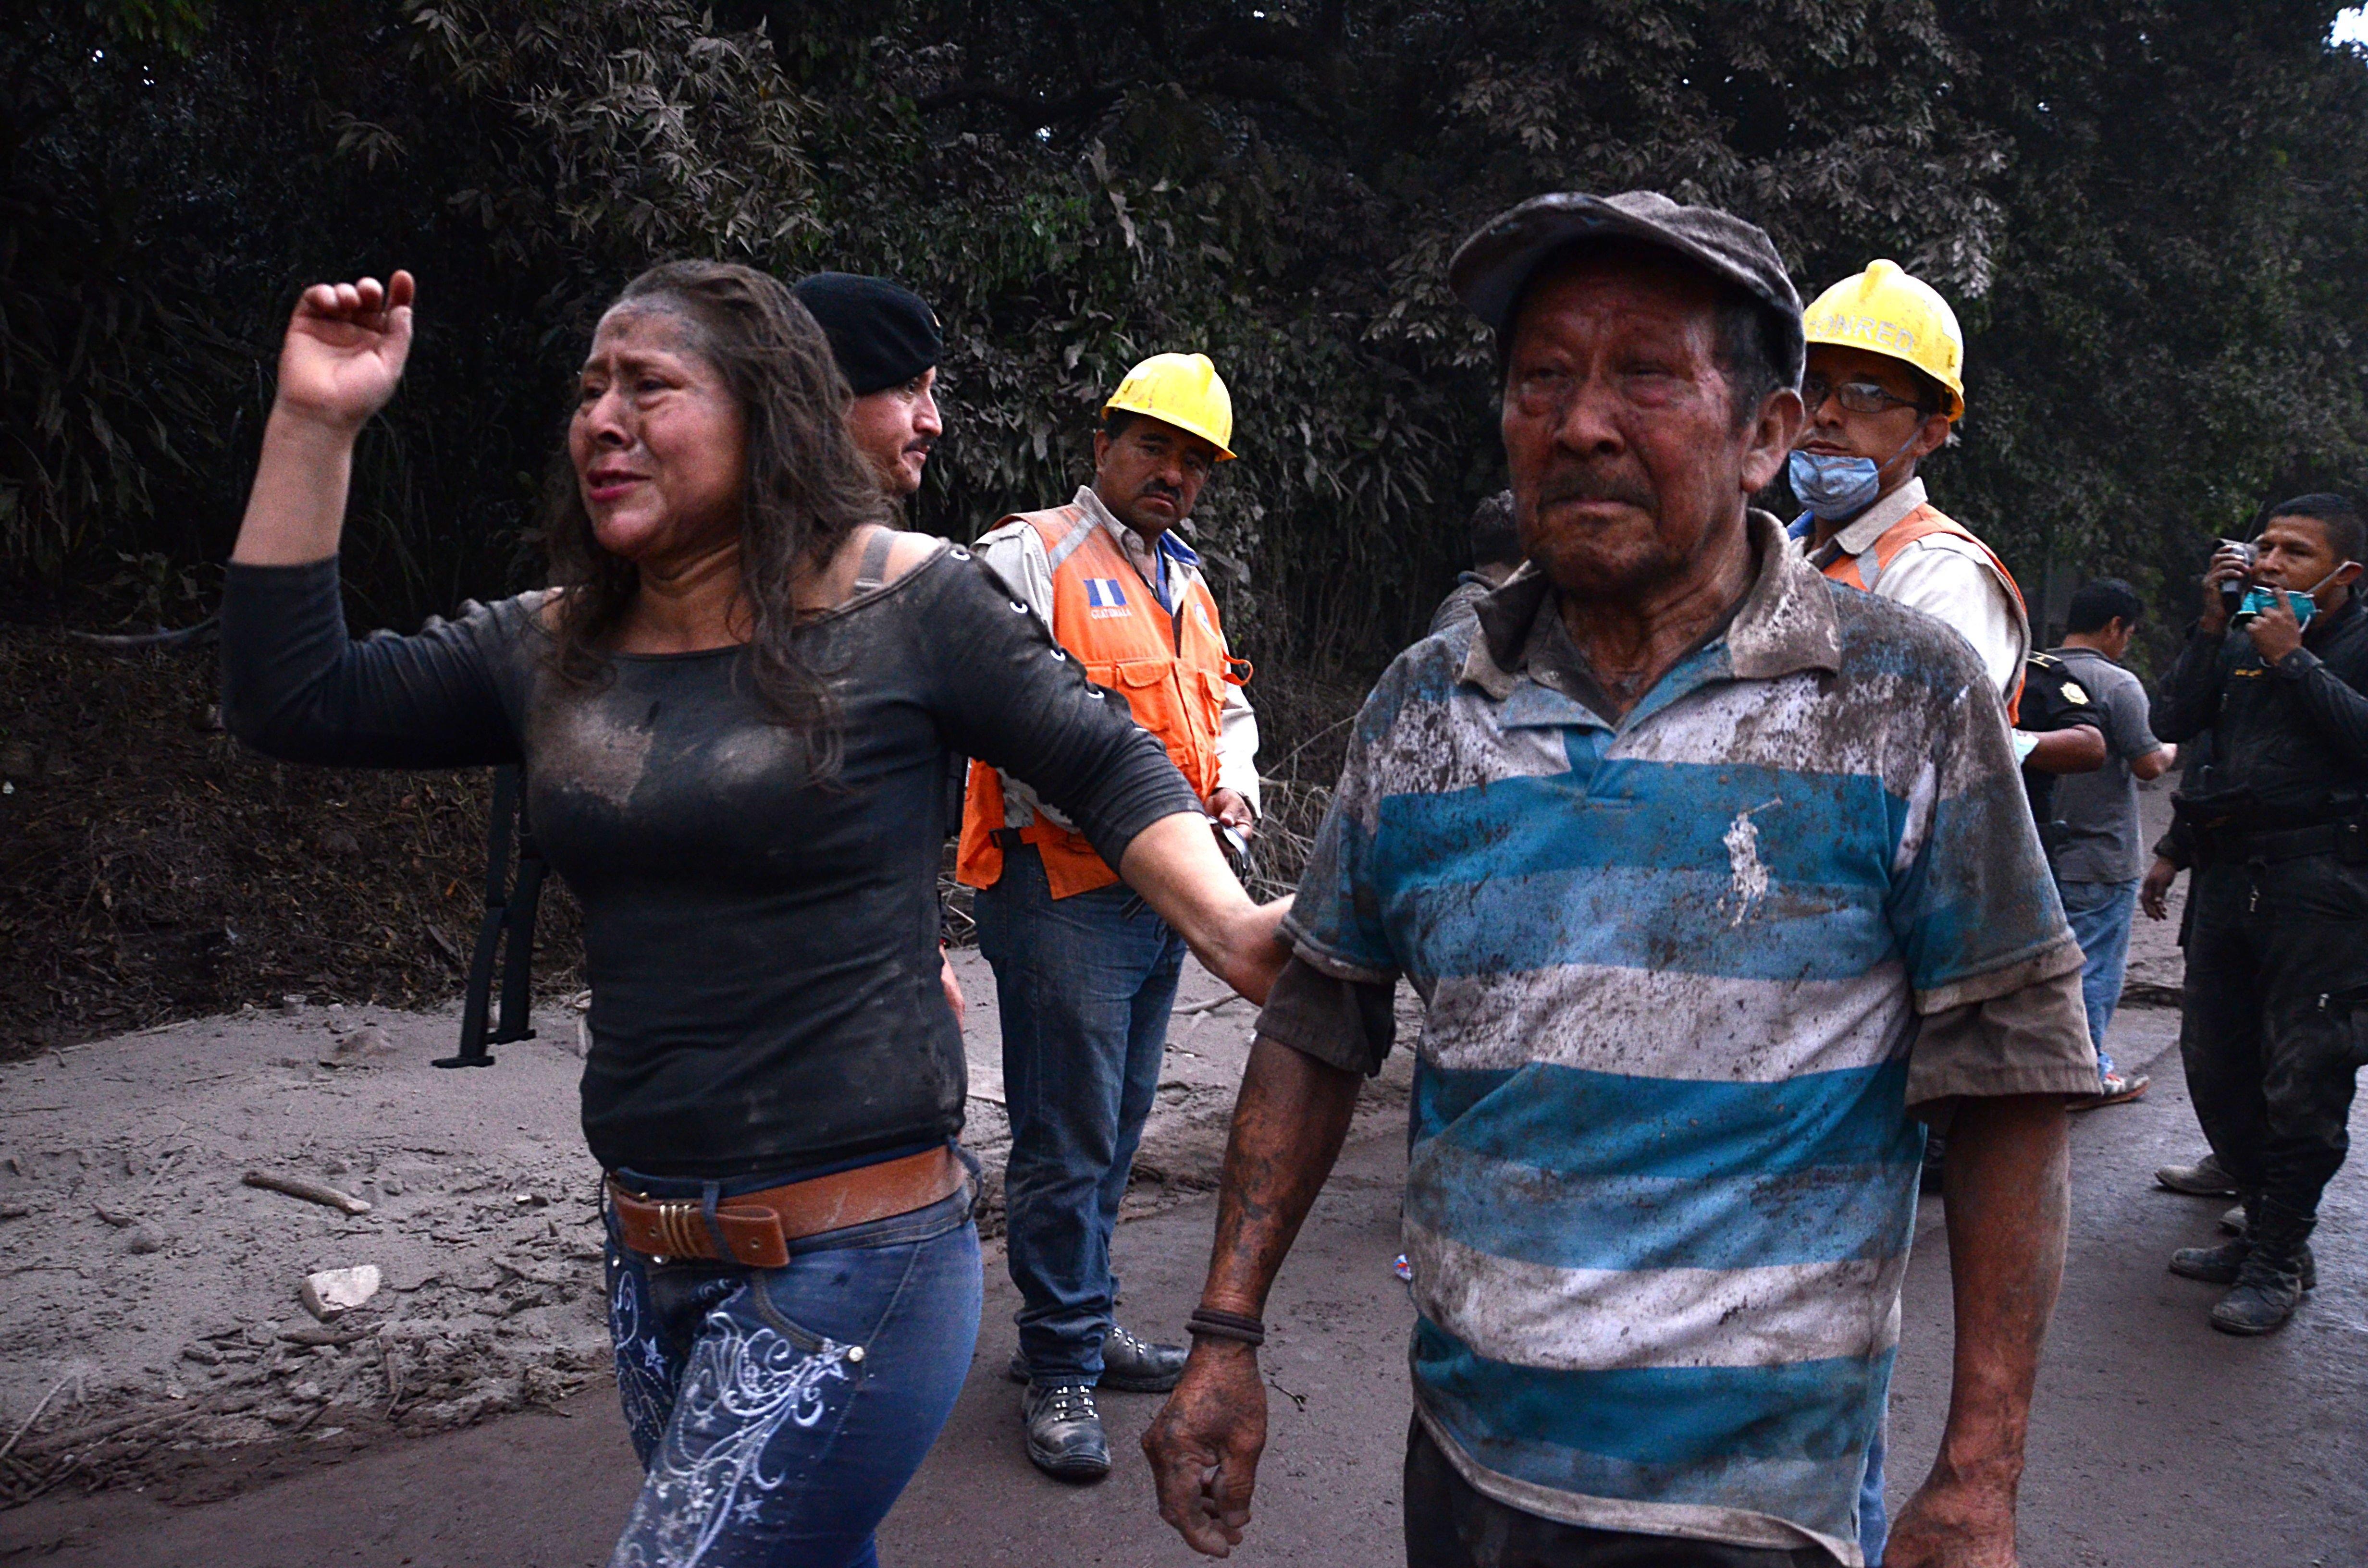 To ποτάμι λάβας του ηφαιστείου «Fuego» εξαφάνισε ολόκληρο χωριό. Δεκάδες οι νεκροί στη